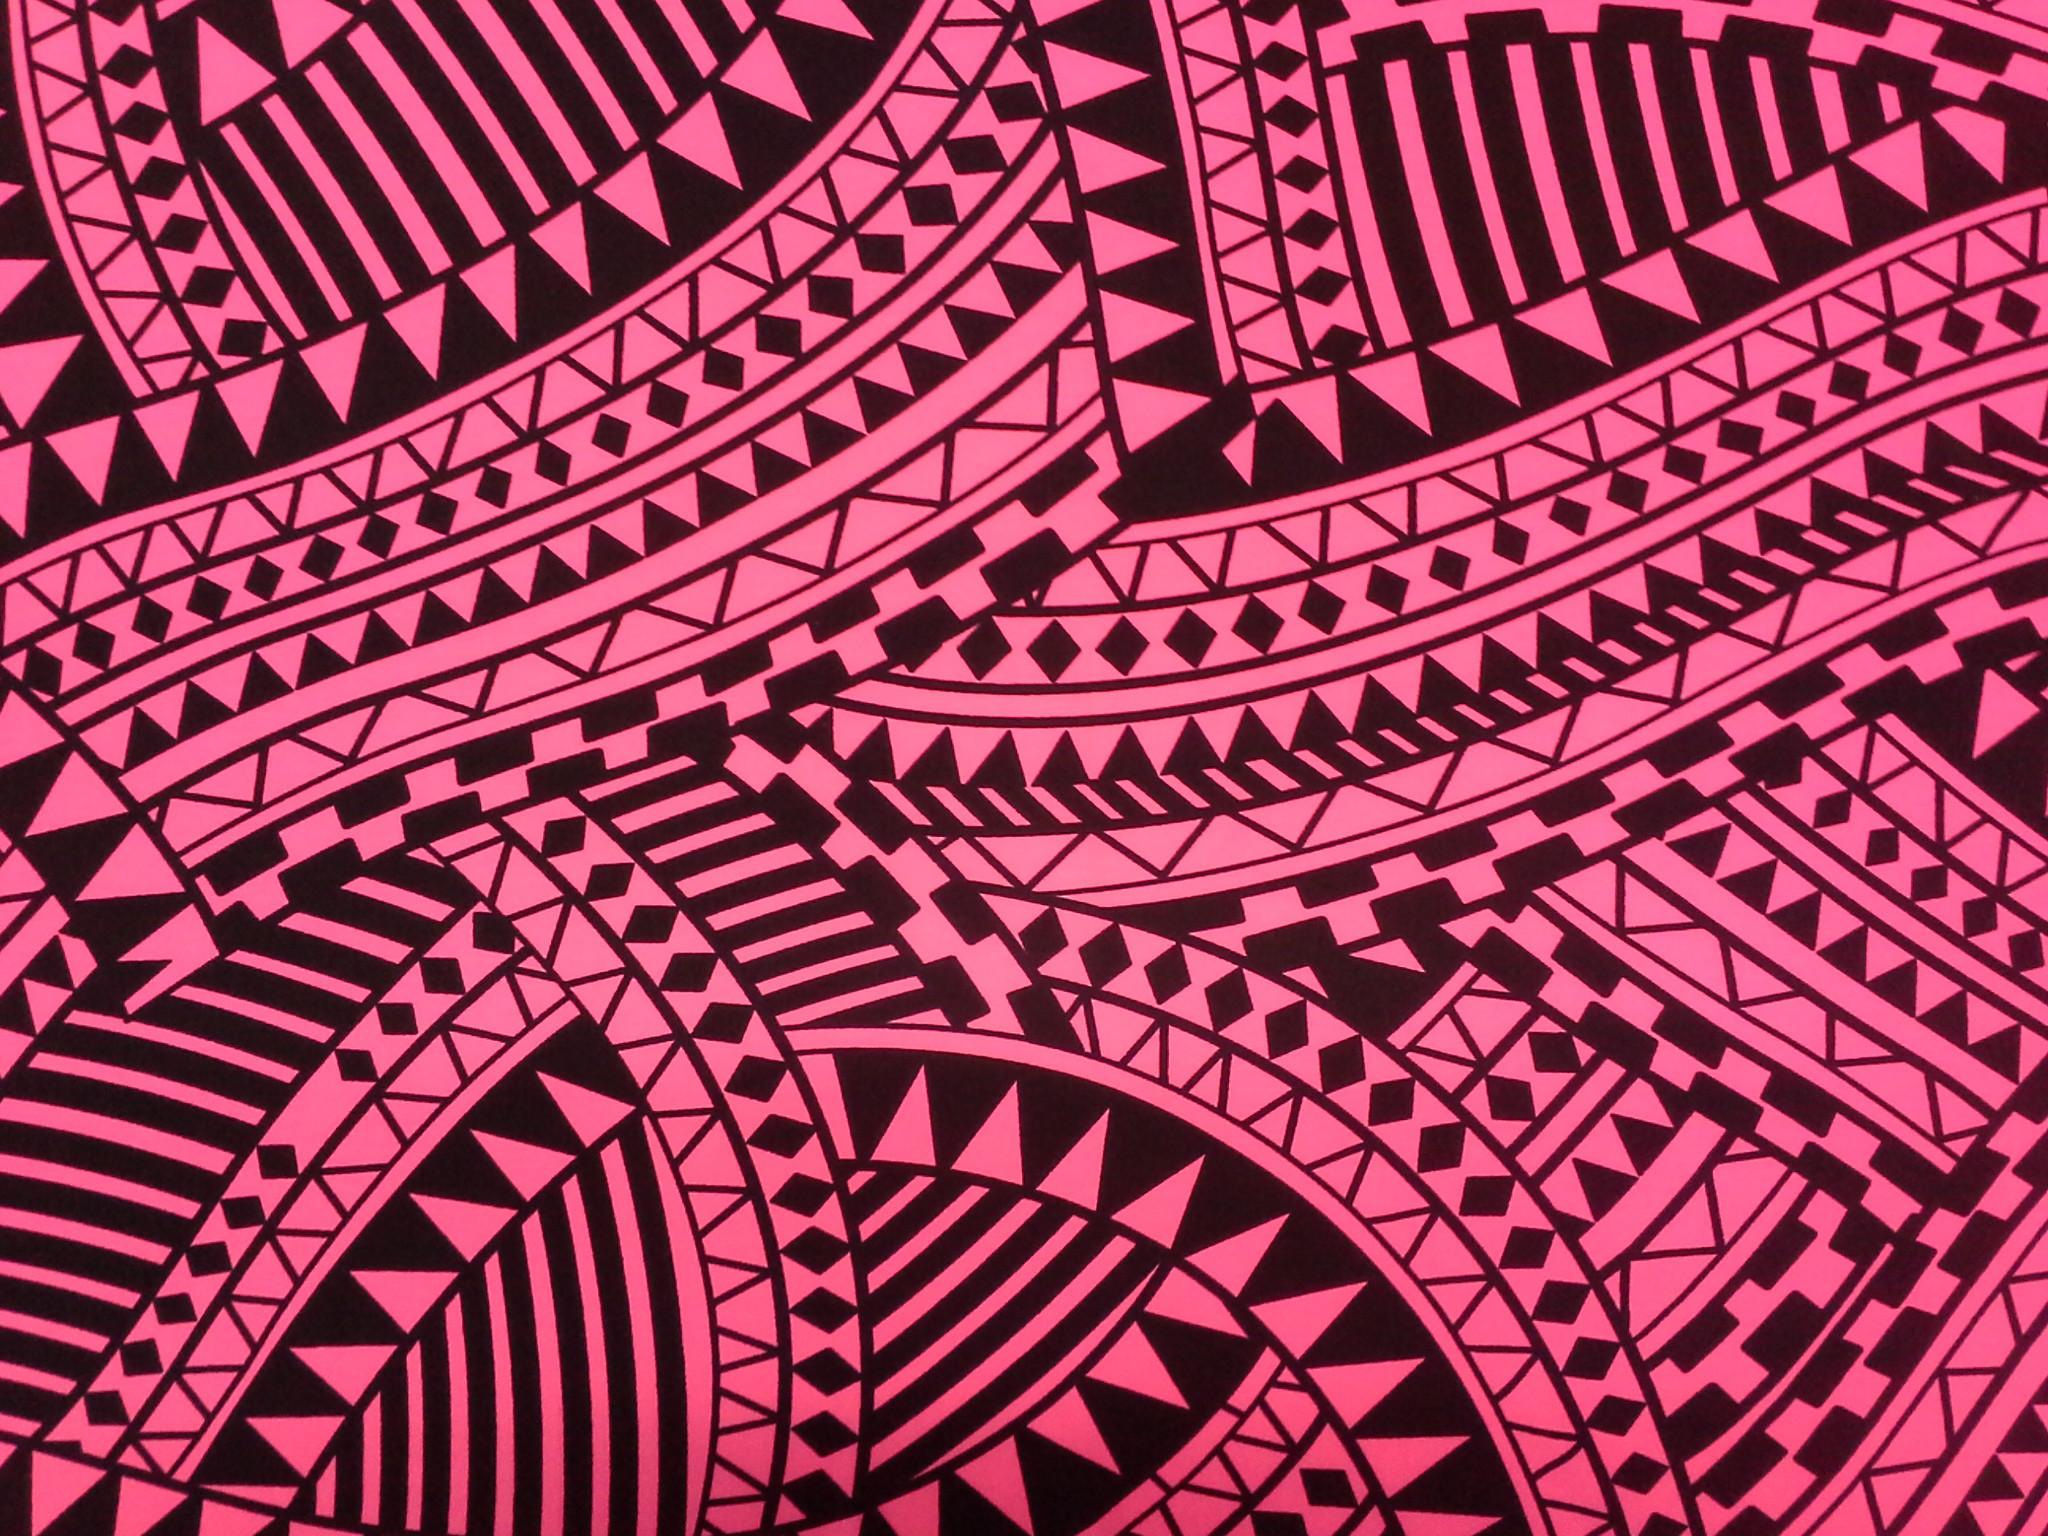 2048x1536 African Tribal Print Wallpaper